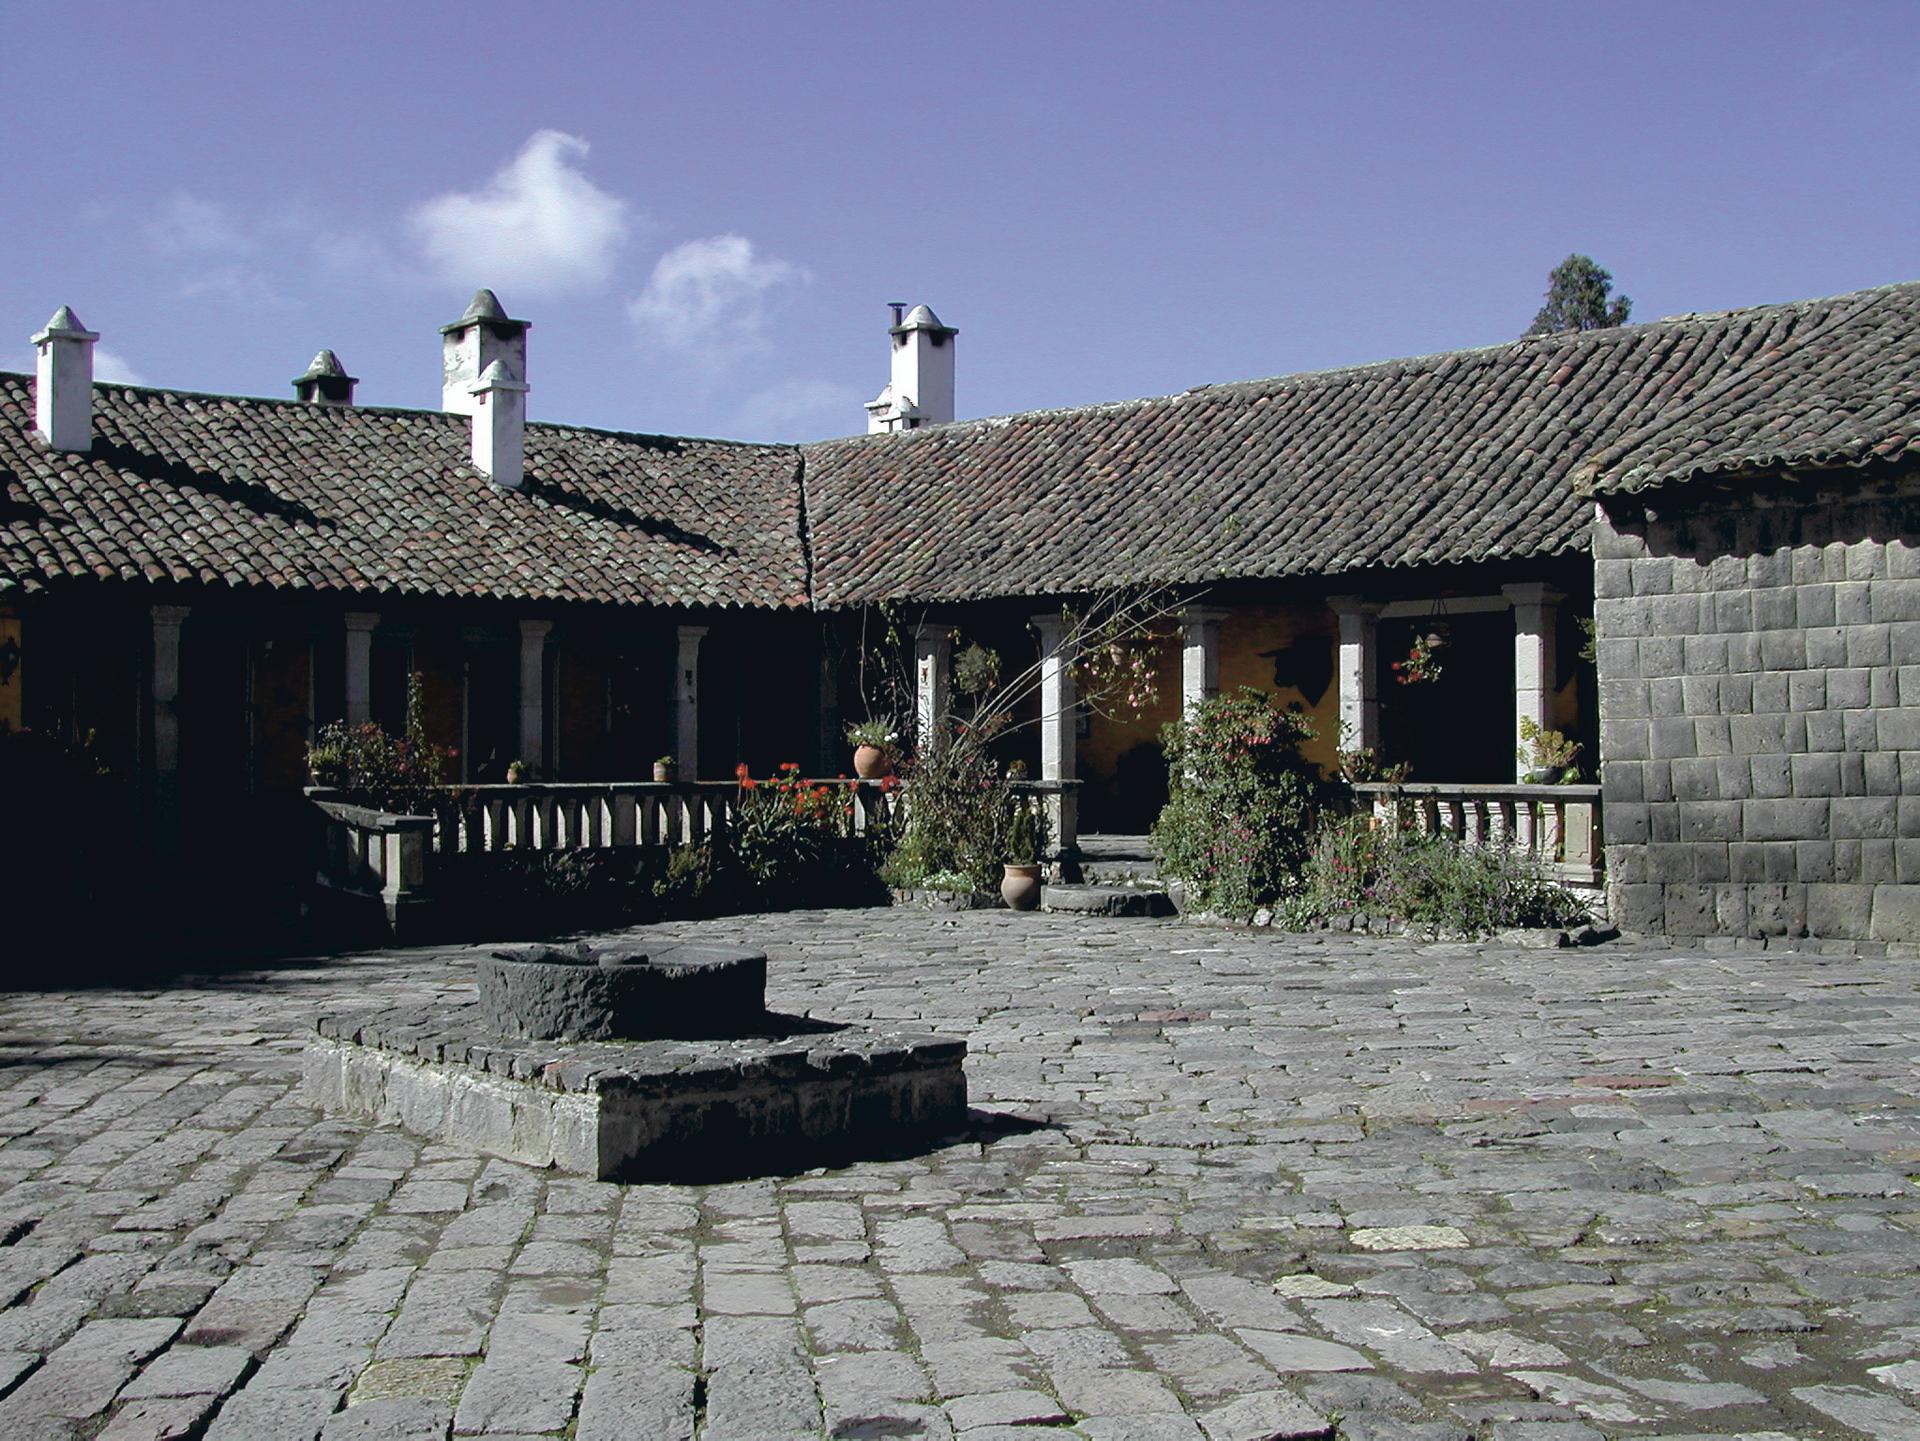 Hacienda San Agustin